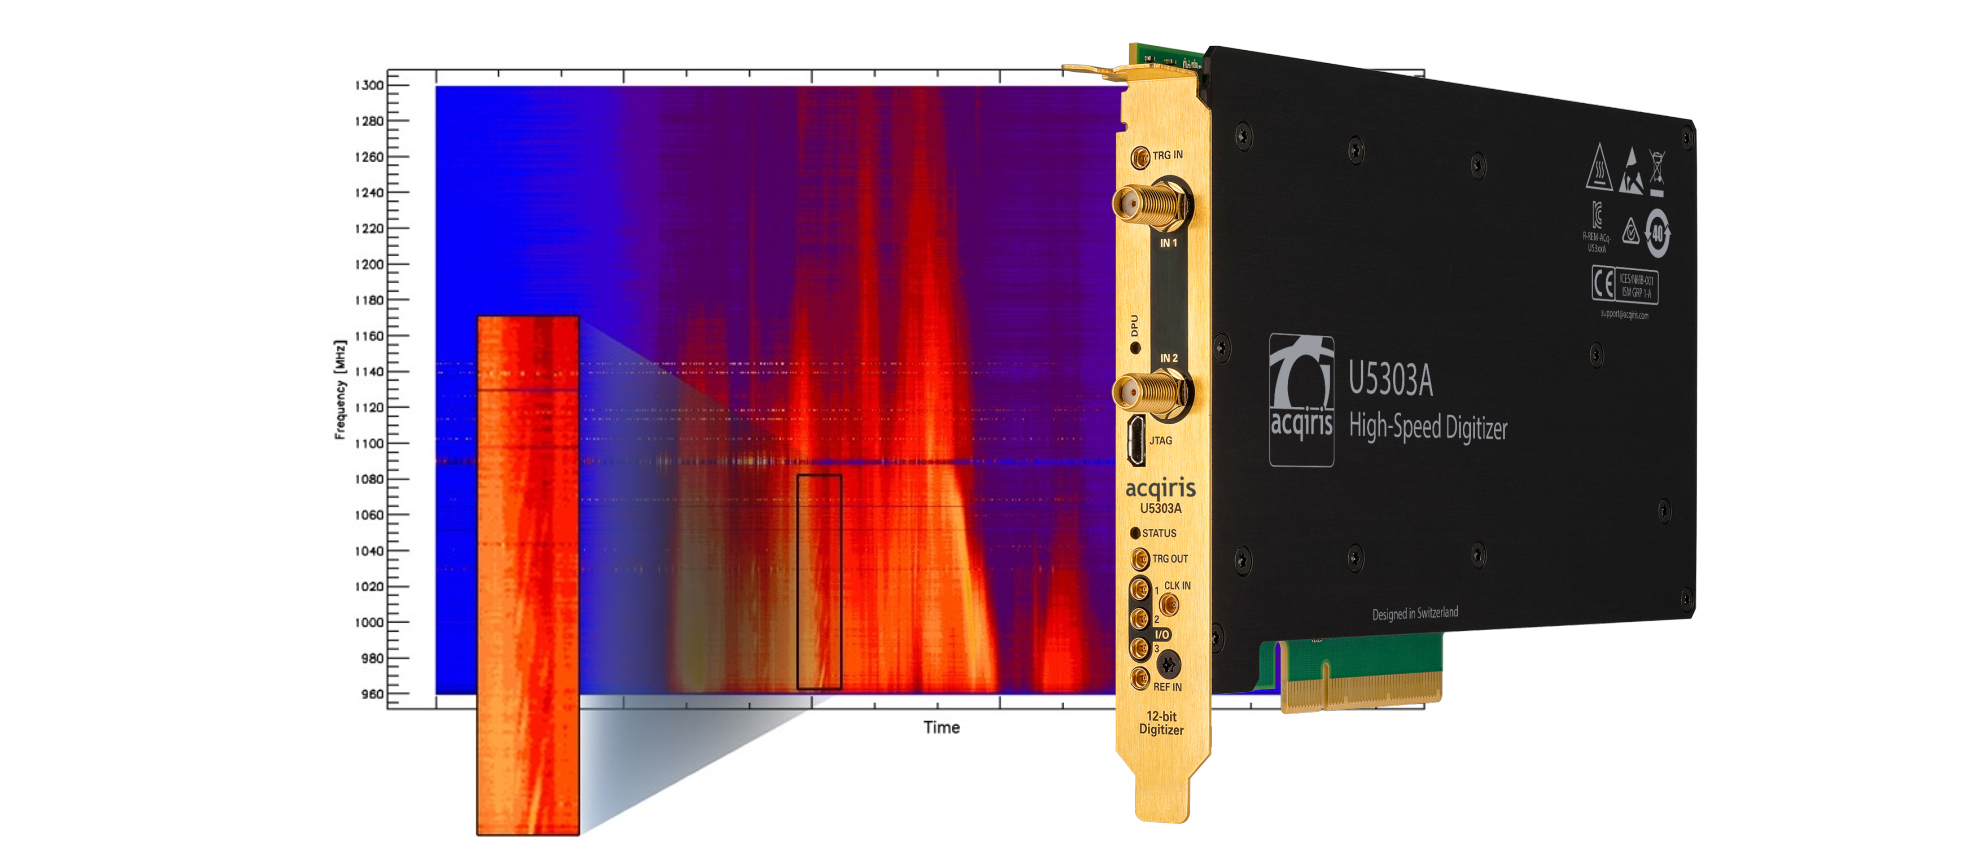 Enhanced Fast Fourier Transform Application on 12-bit High